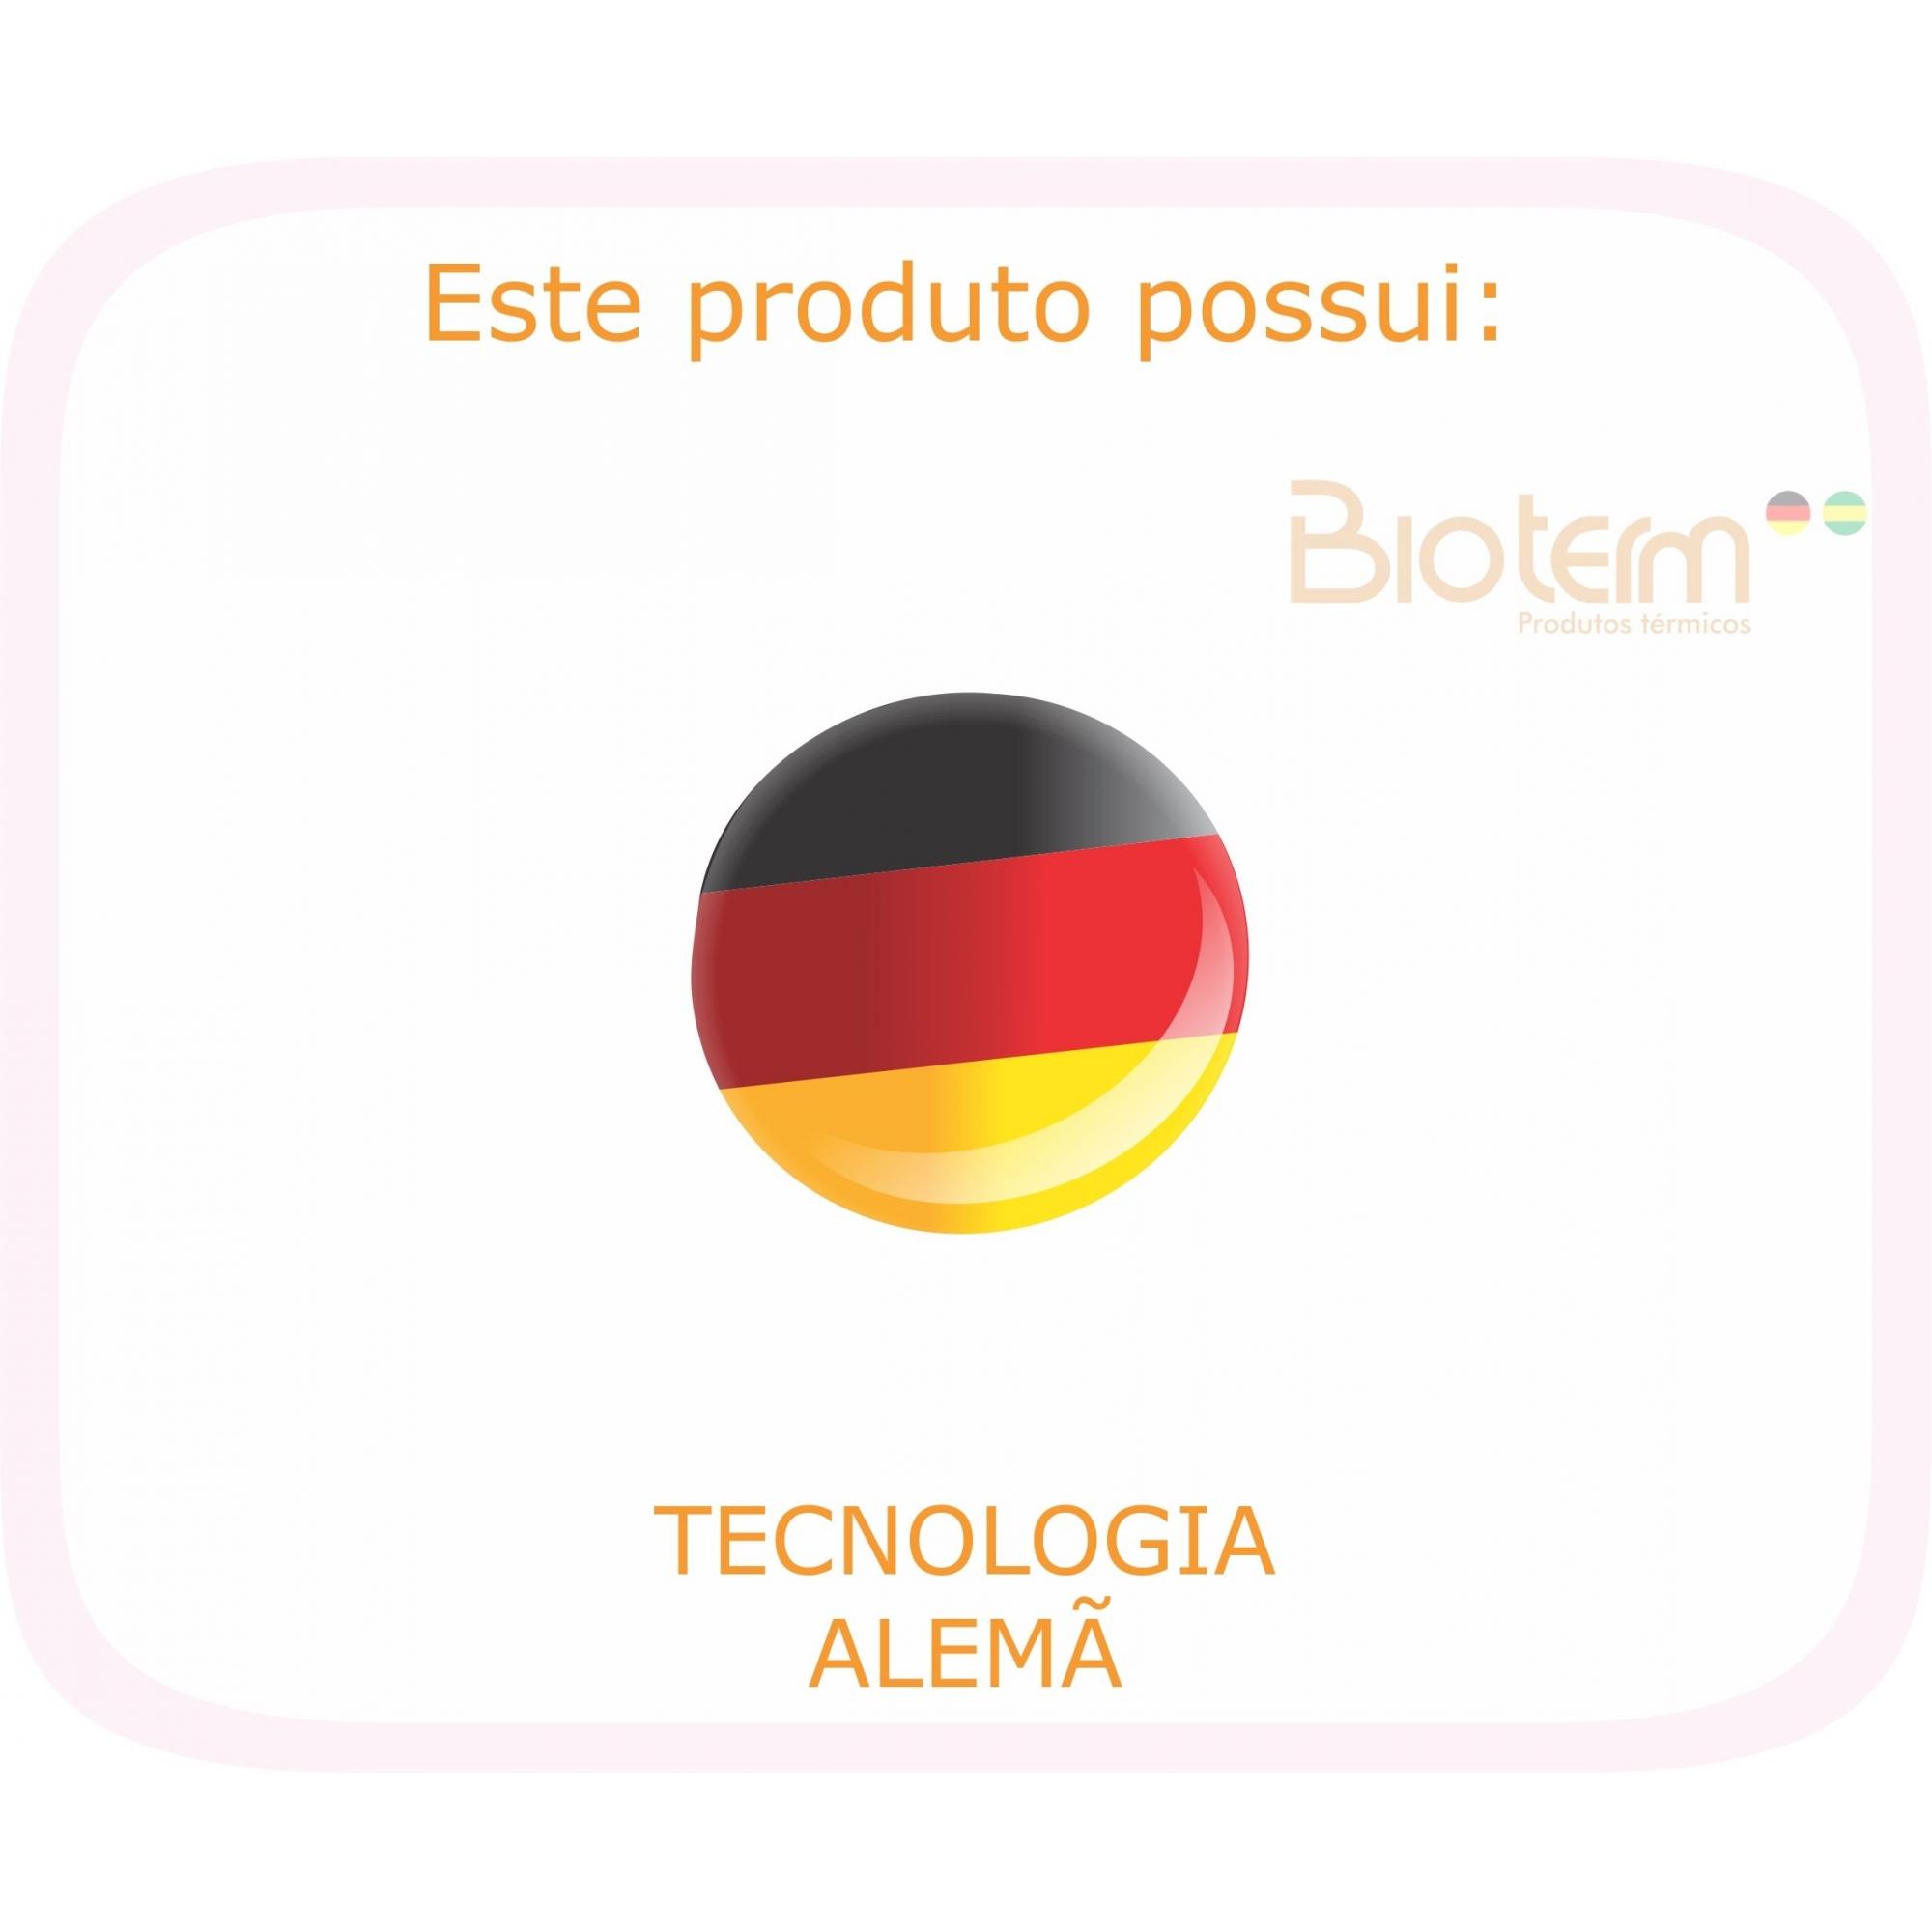 Manta Termoelétrica Massageadora Corpo Inteiro Digital Bivolt Automático Bio Term